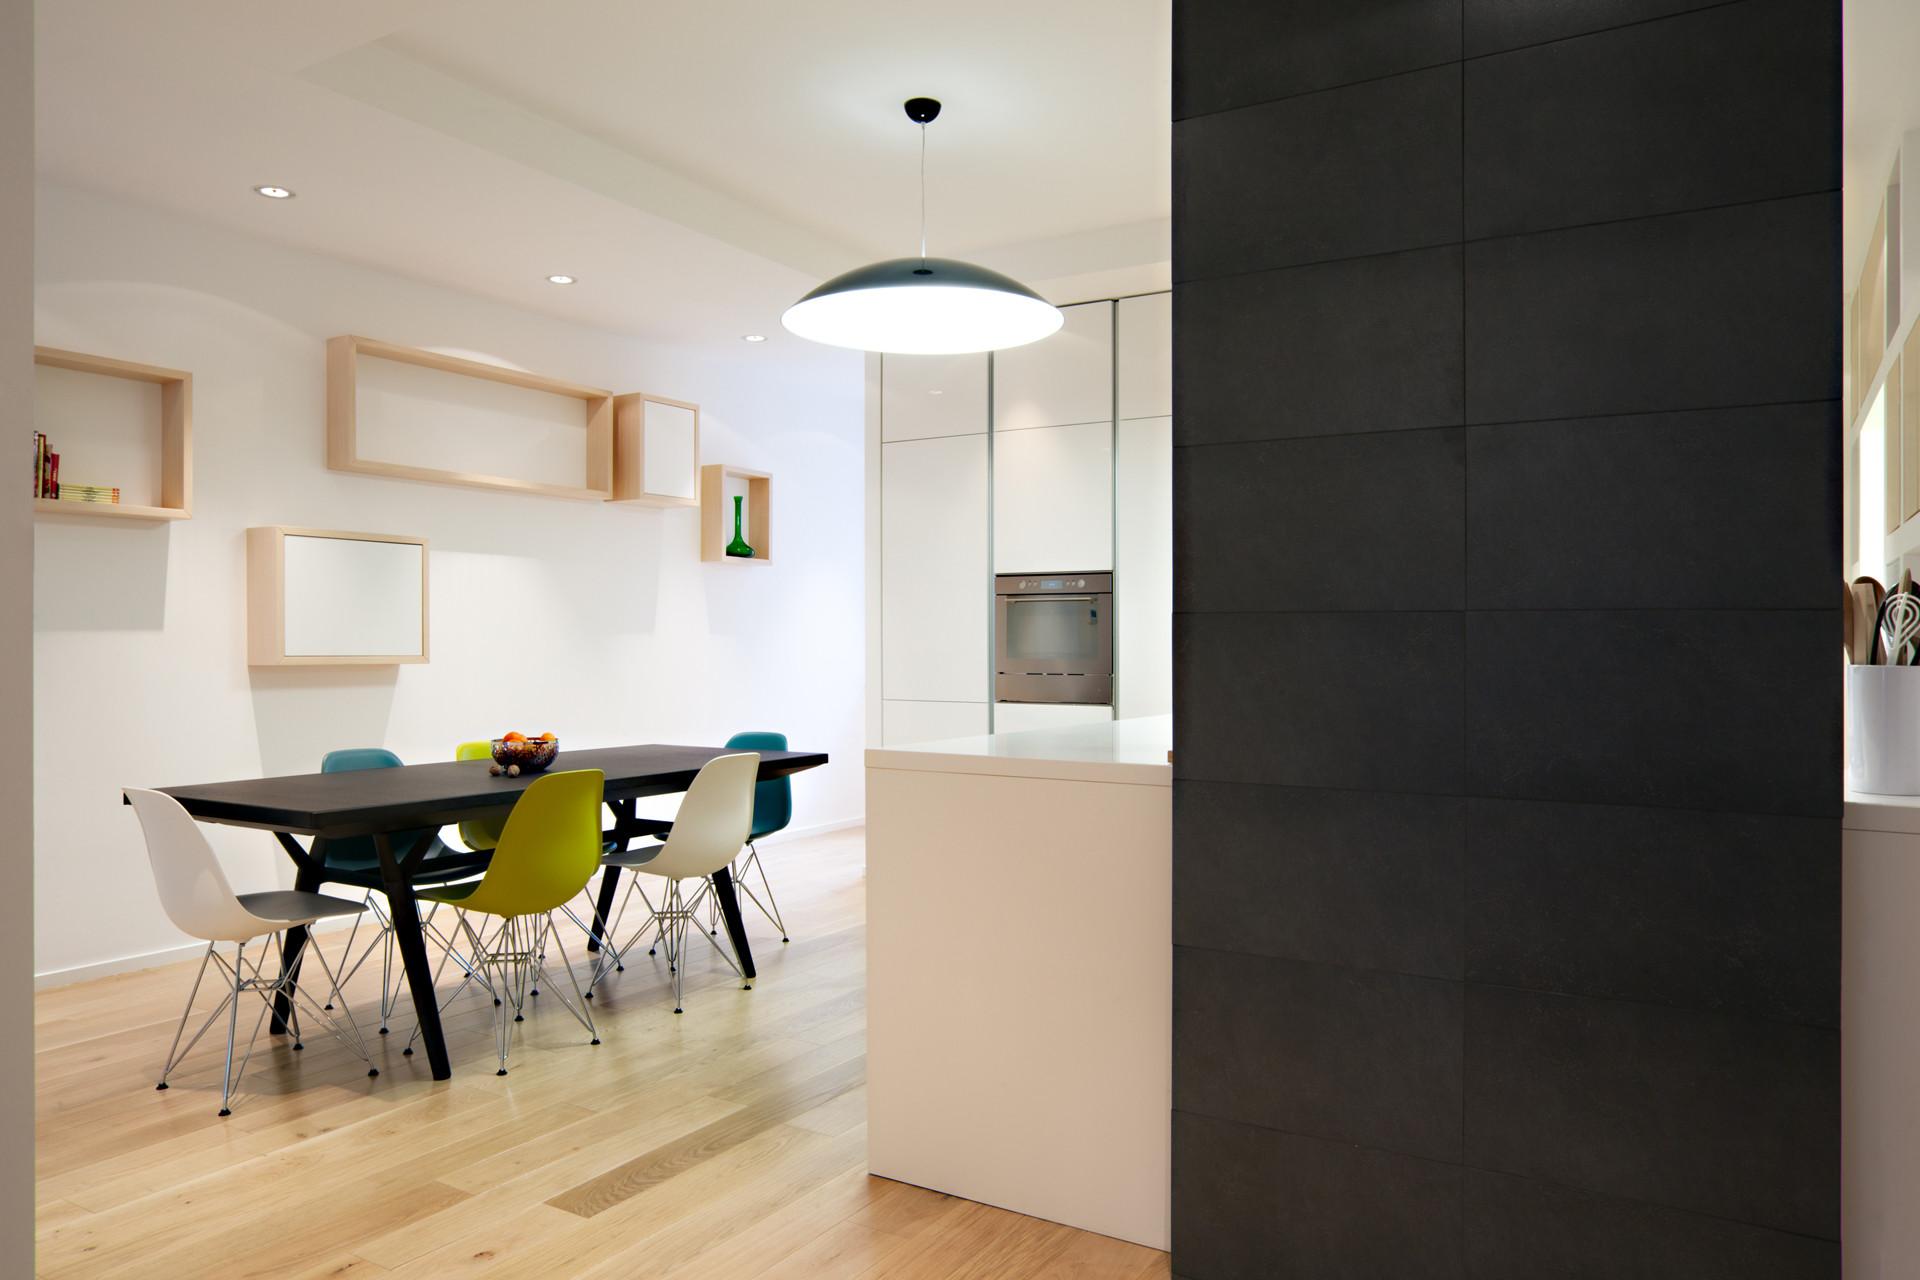 Wisp-Architects- Oxilia Apartment 6